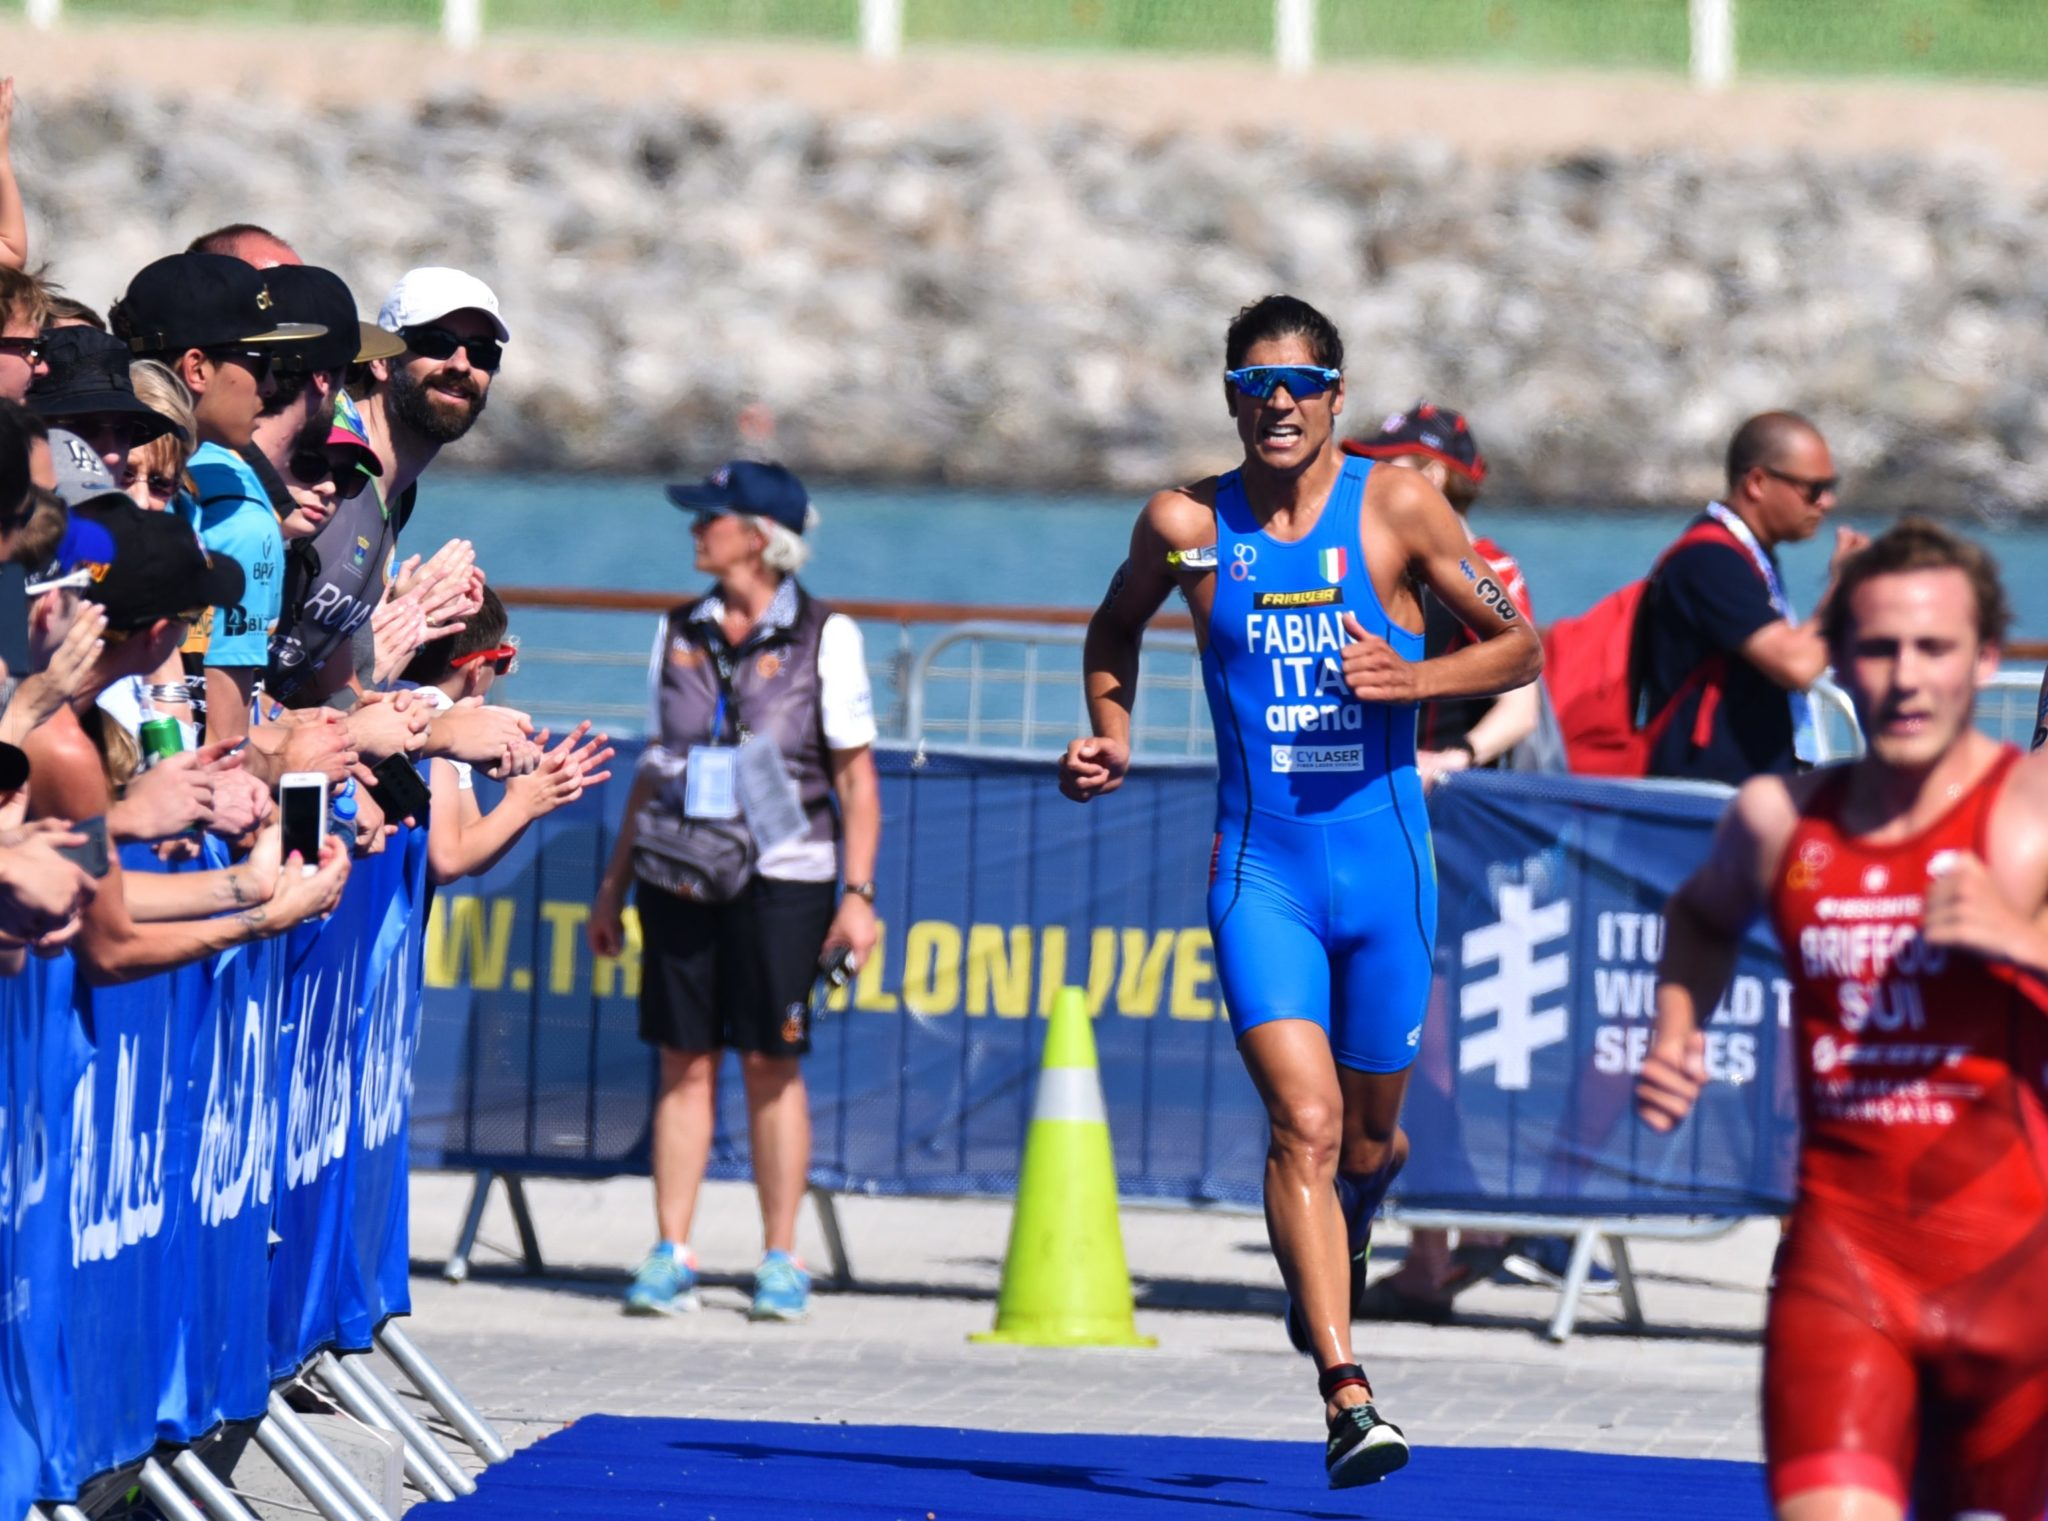 Tokyo 2020 - Alessandro Fabian verso la terza Olimpiade ...